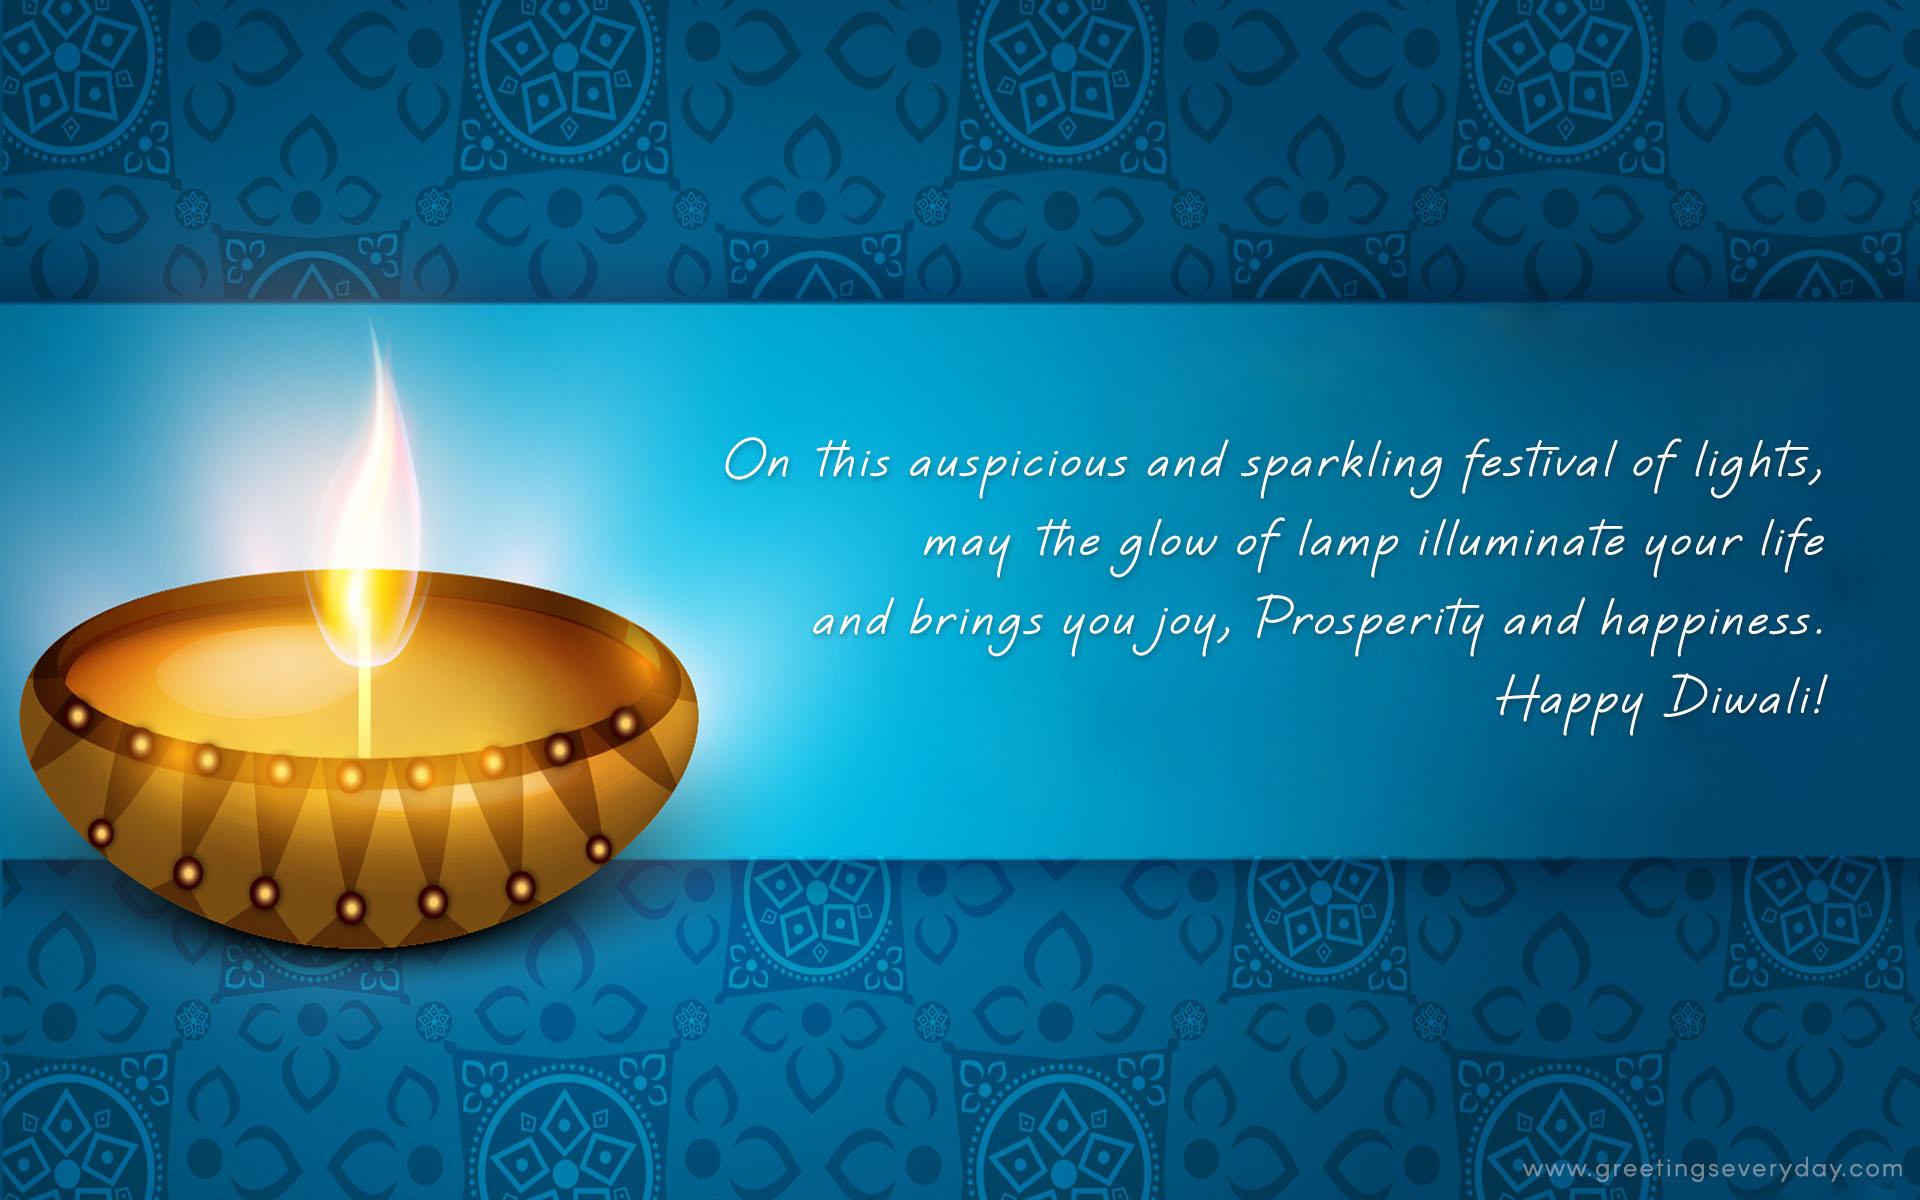 Deepavali 2018 Wishes